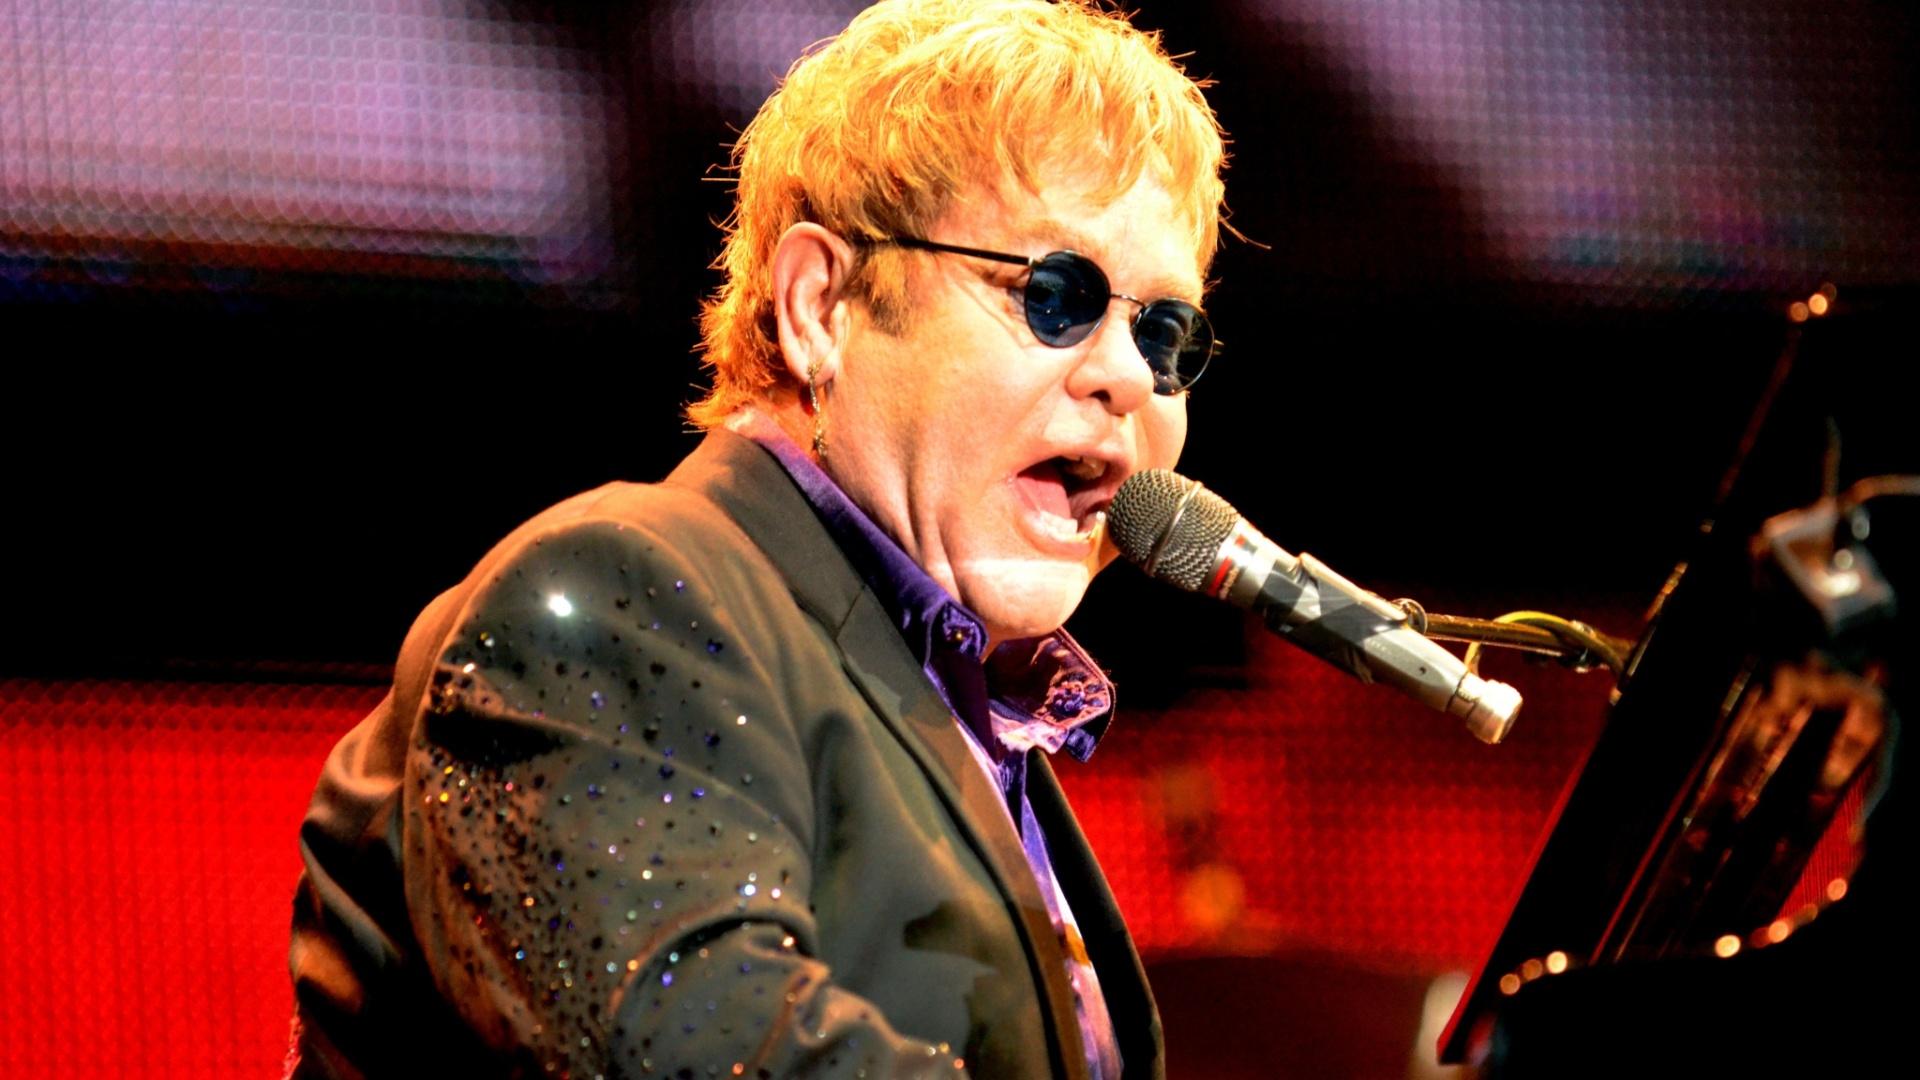 Elton John wallpaper 1920x1080 62383 1920x1080